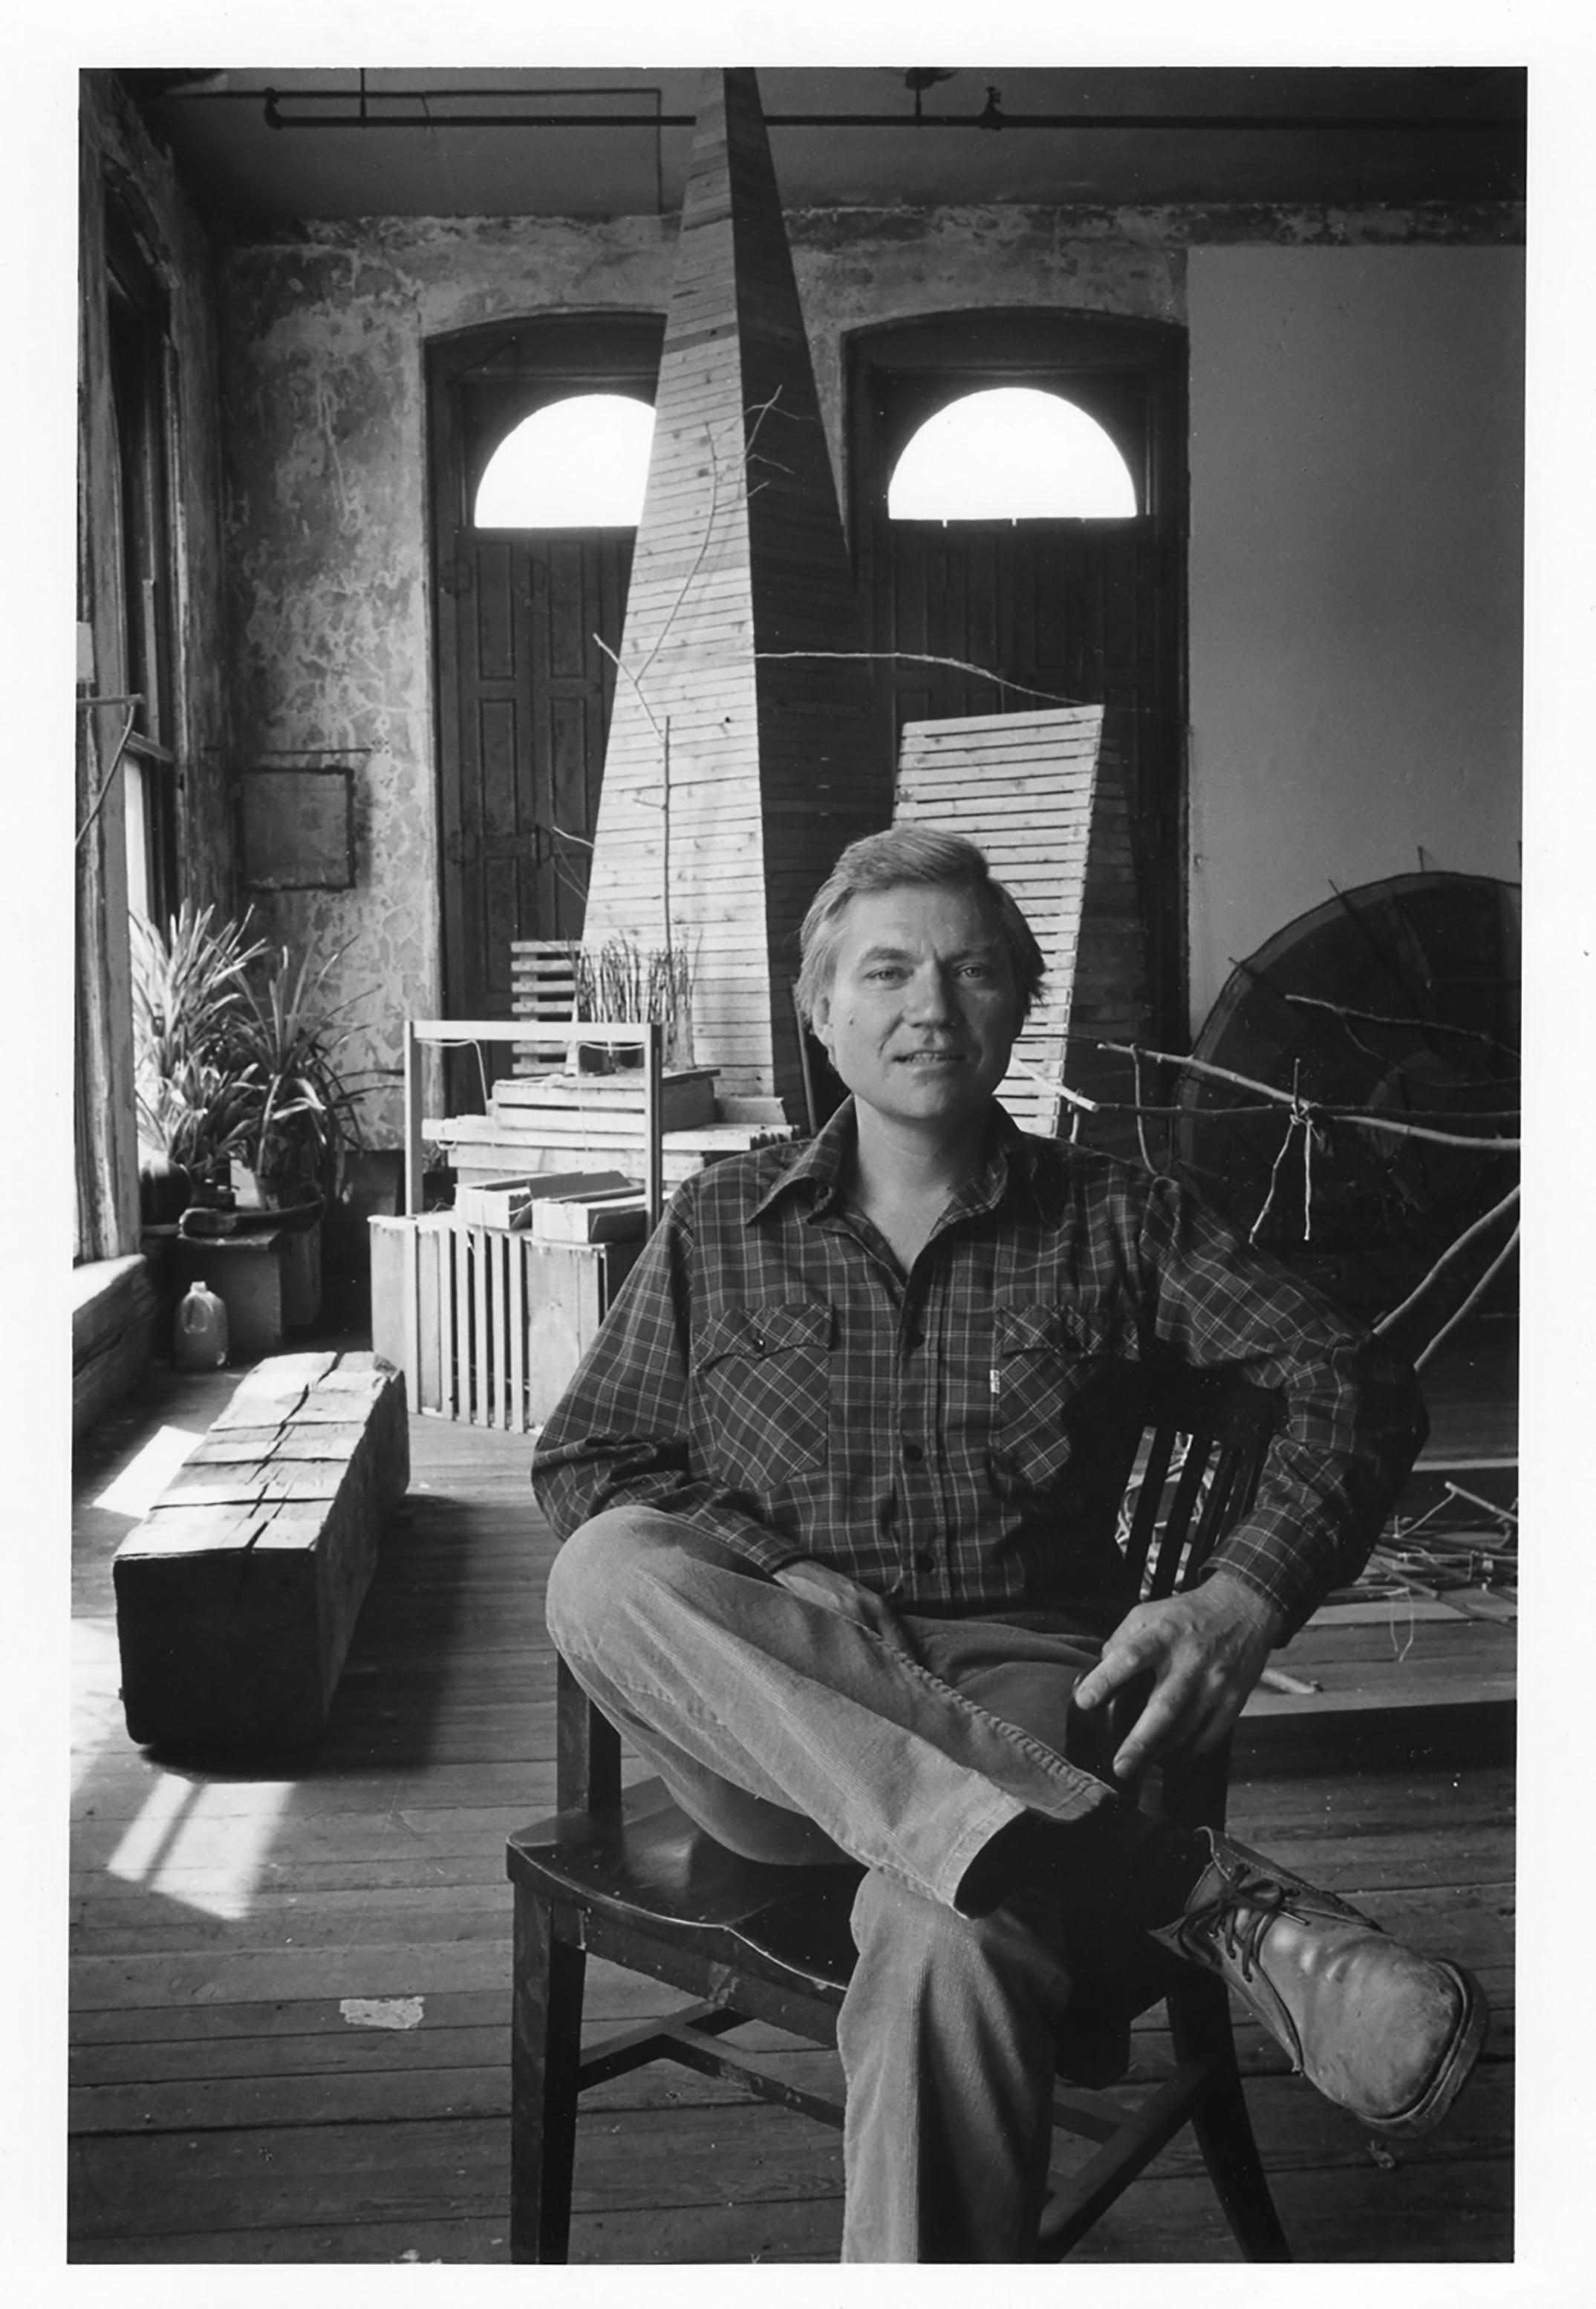 JU in his studio loft, 4th floor Fain Carpet building, 128 North Main St, Providence, RI